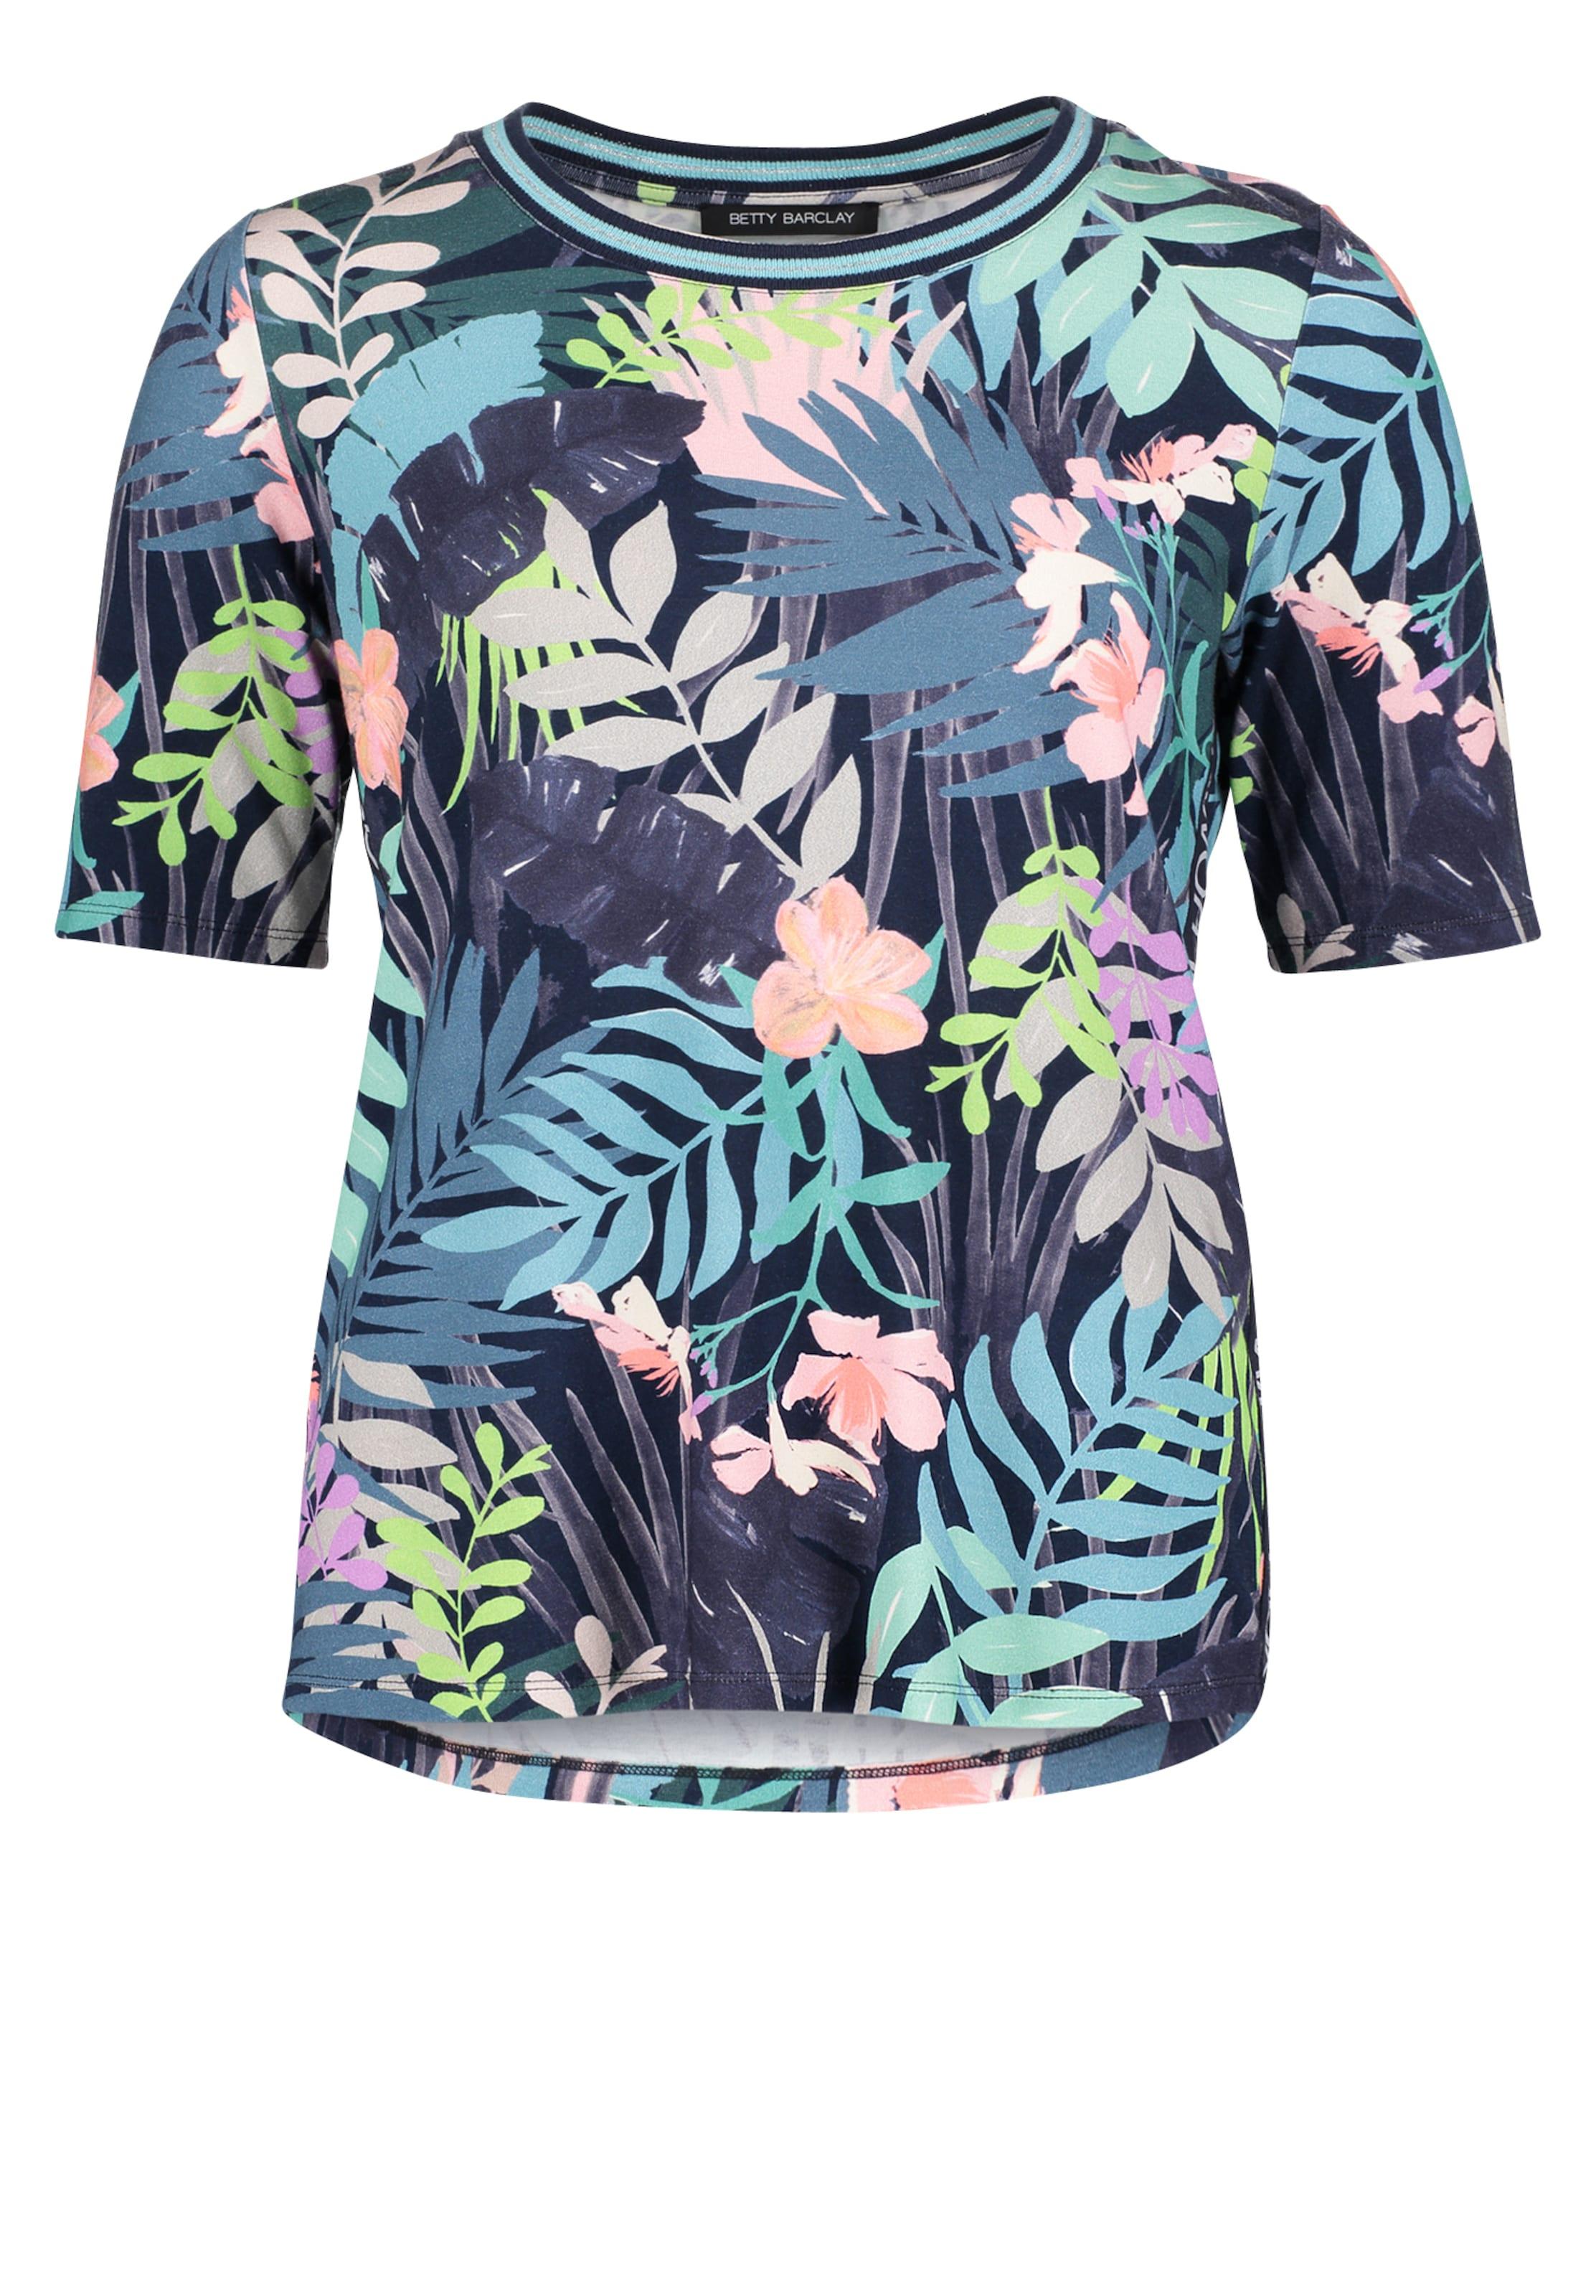 Betty Barclay Barclay NachtblauMischfarben Betty Shirt In In NachtblauMischfarben Betty Shirt Barclay Shirt jAR435L